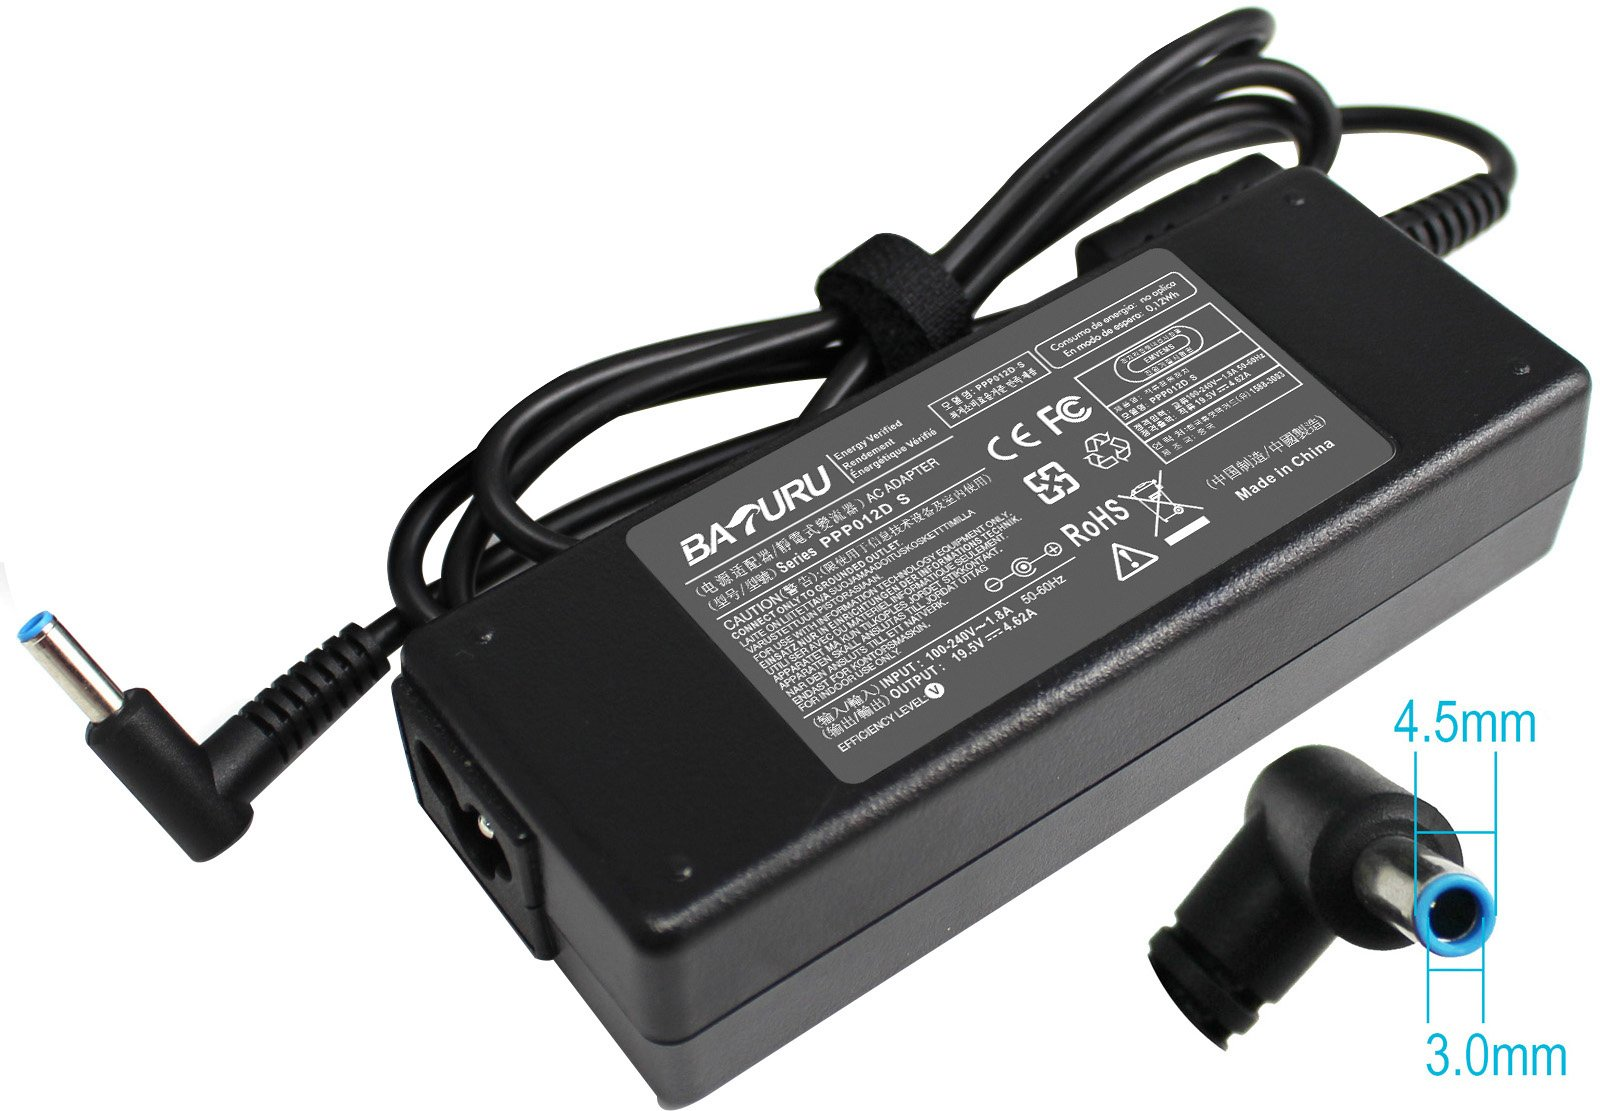 Baturu 90W AC Adapter charger for HP ENVY 17-j010us Pavilion 15 17 Notebook pc 17-e127sf 17-e000 17-e010us 17-e054ca 17- e071nr 15-e029TX 15-e026tx 14-e035tx 14-e022tx 14-e021tx